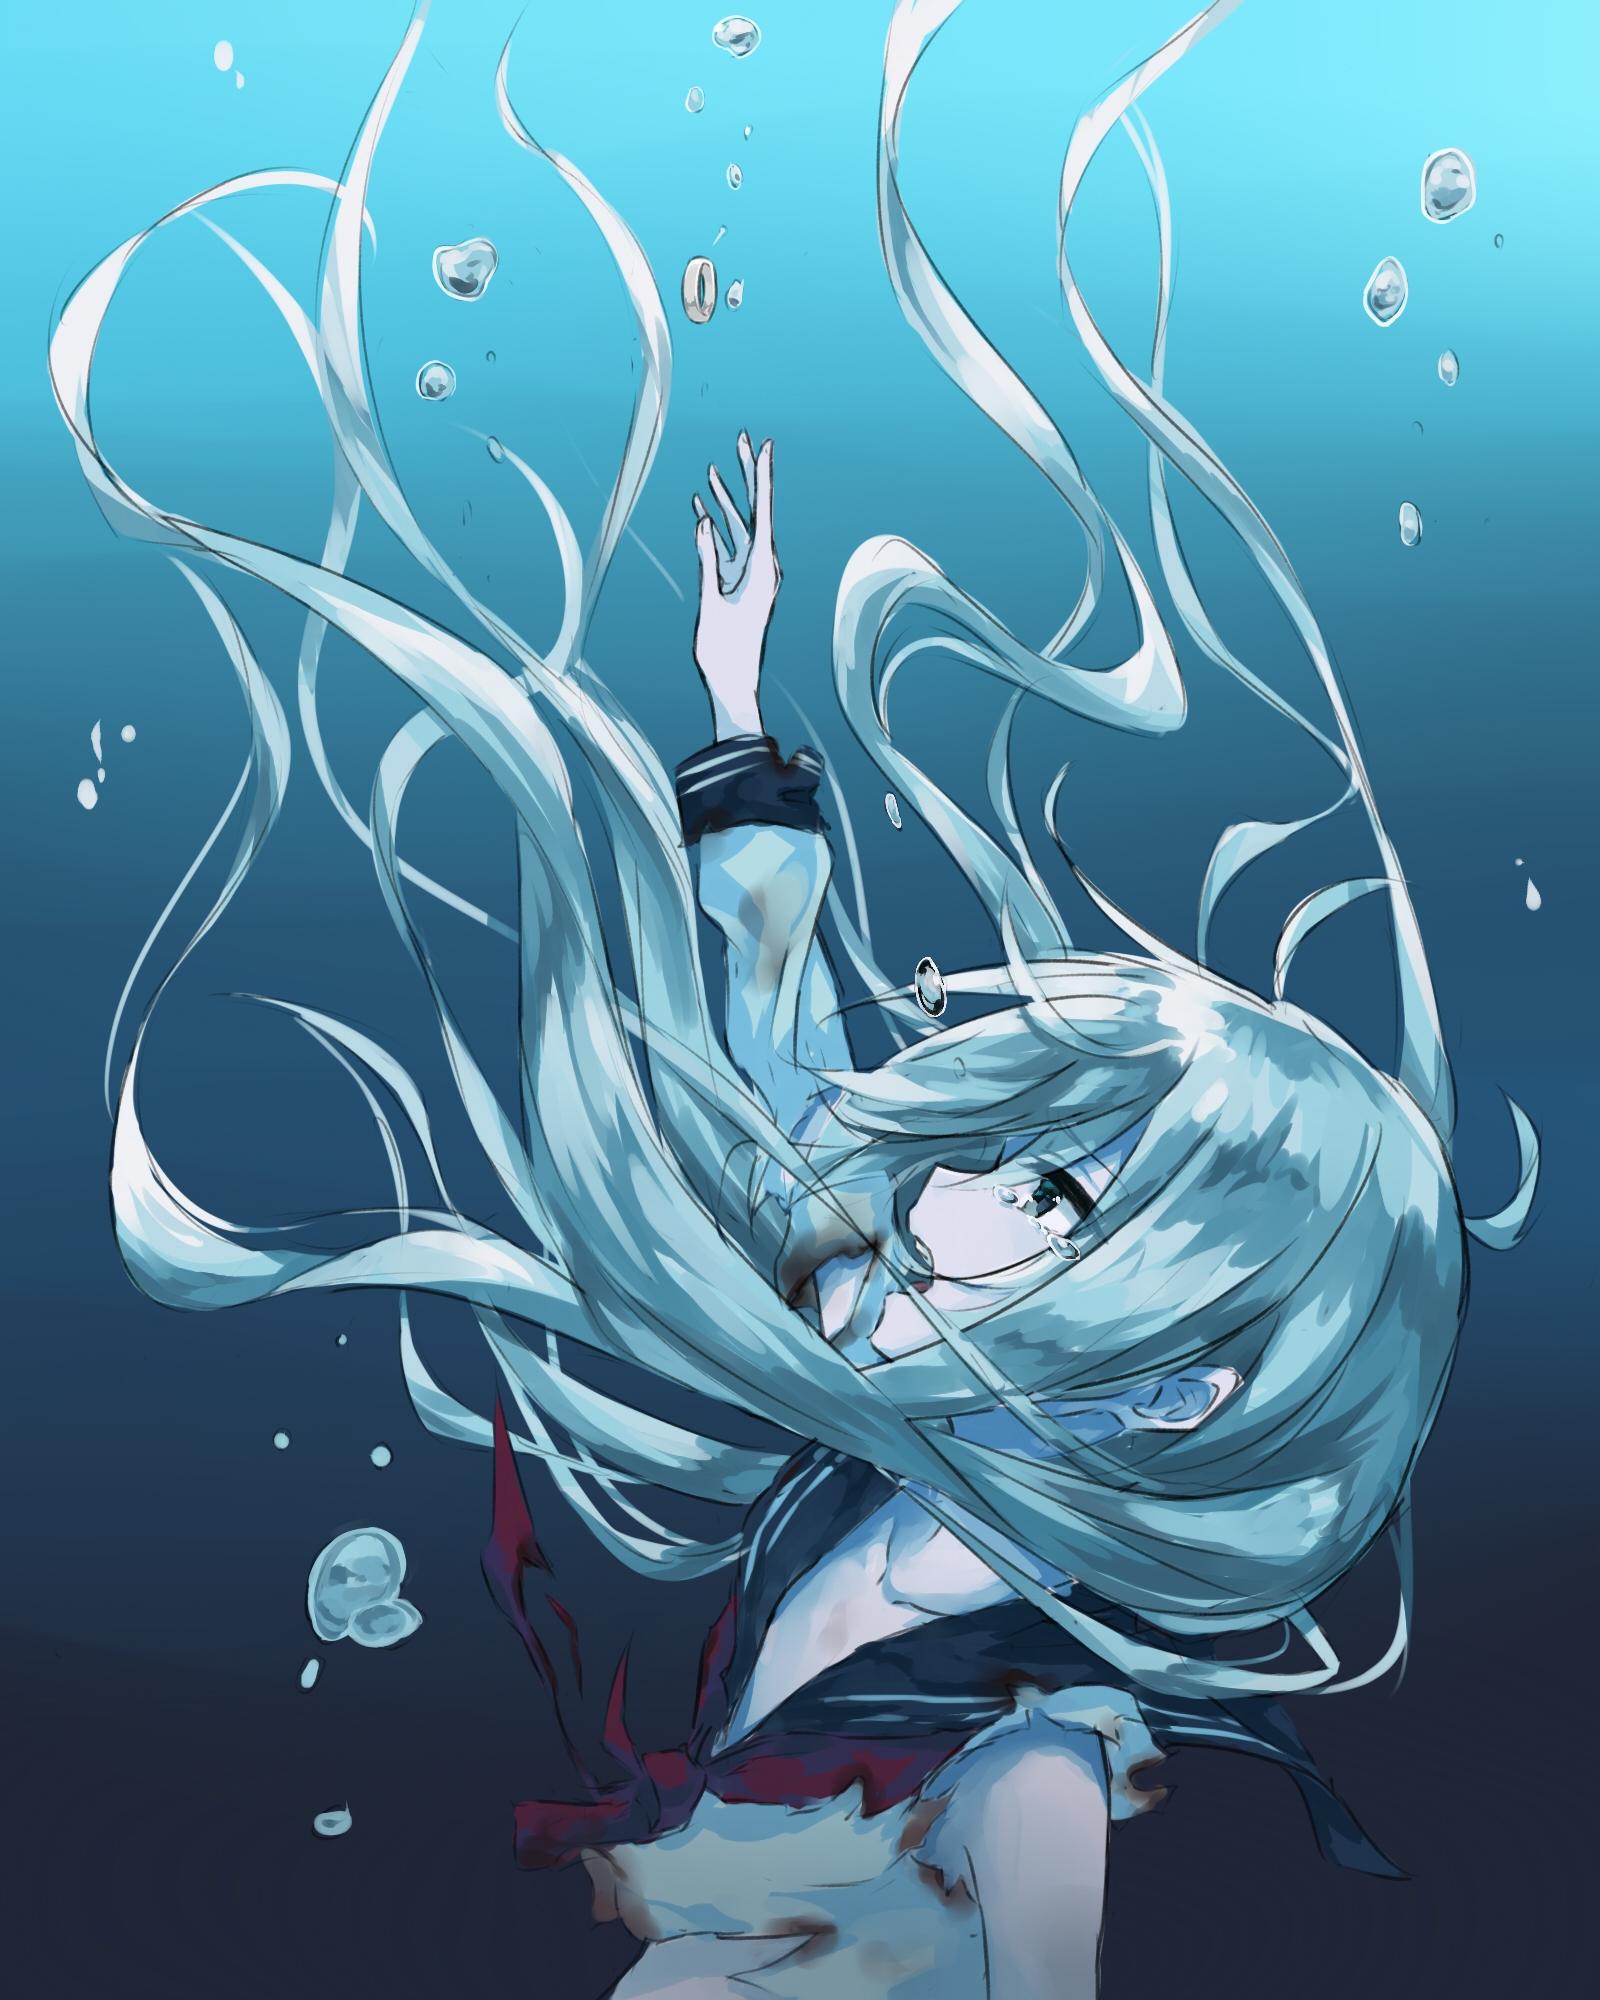 1mib 1600x2000 Sad Anime Girl Wallpaper Hd 4231 Anime